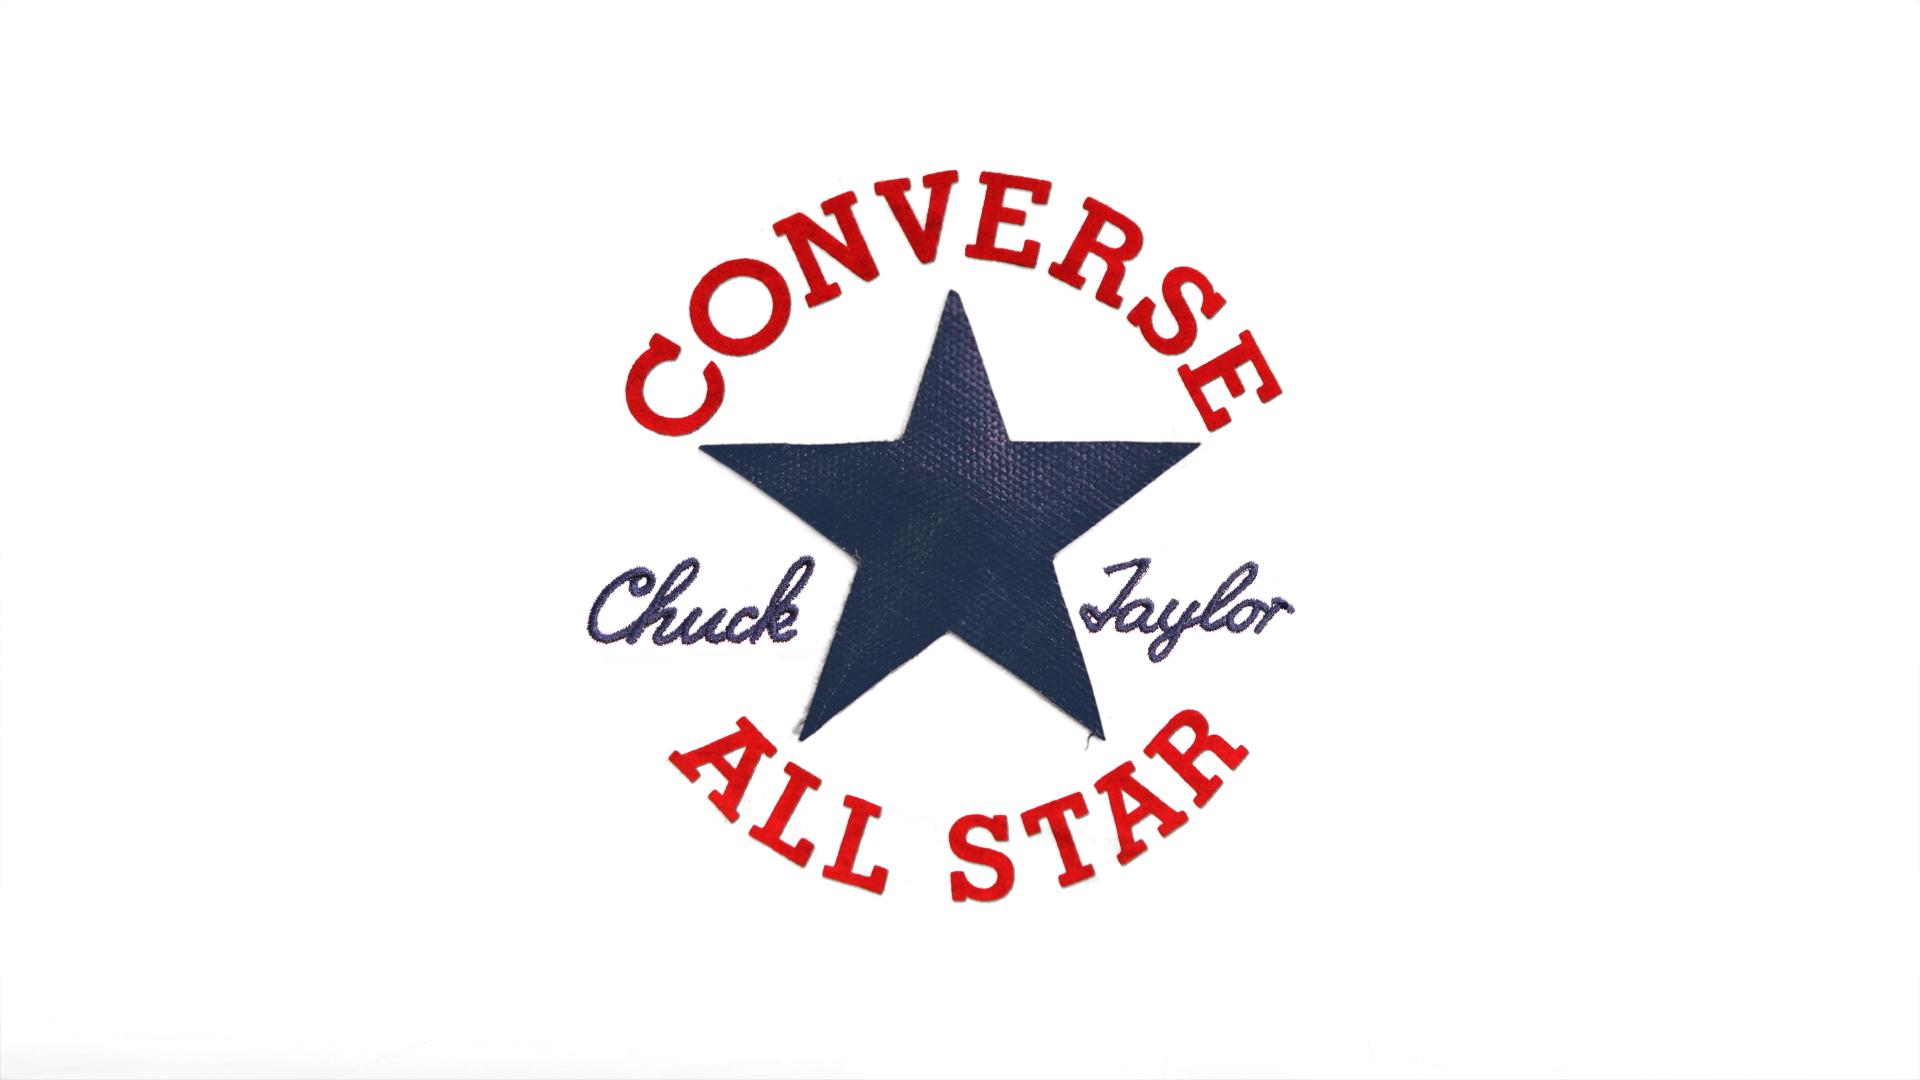 Converse_All_Star_FINAL